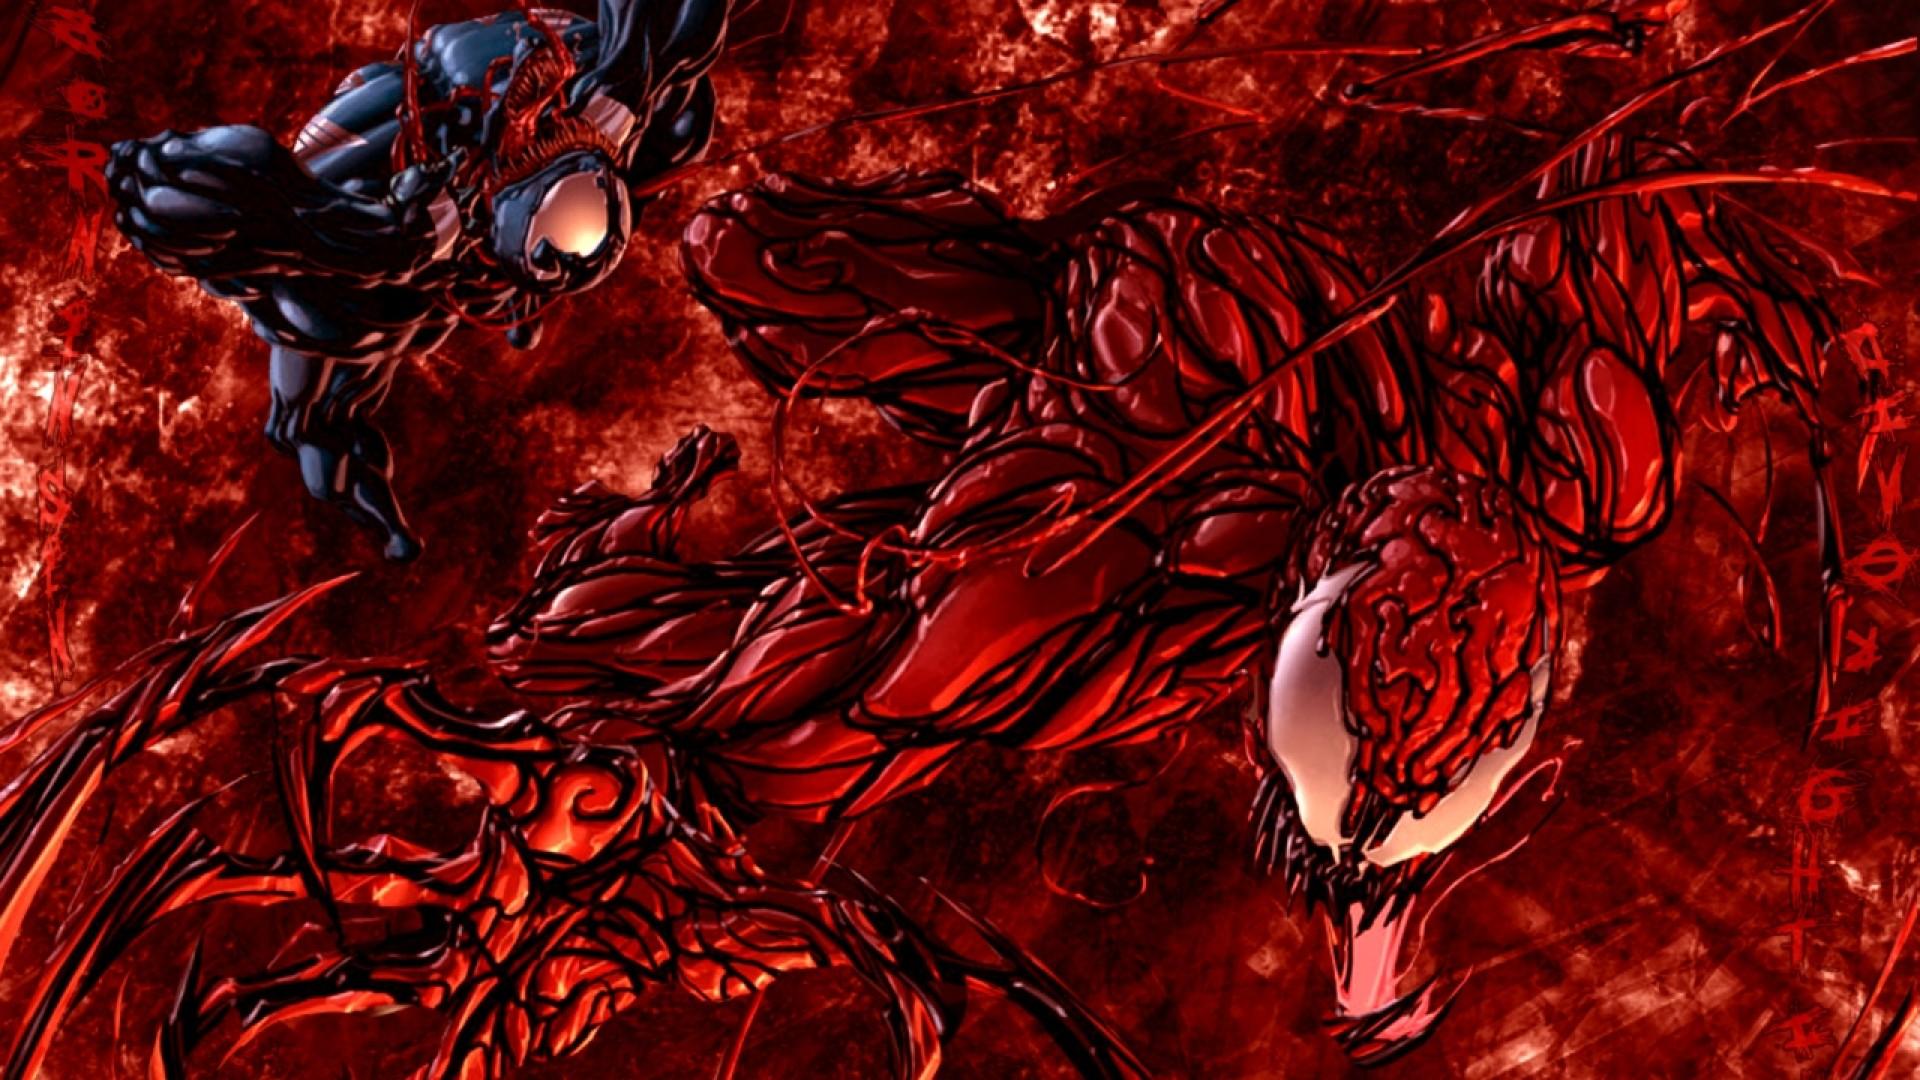 Carnage Wallpaper HD 1920×1080